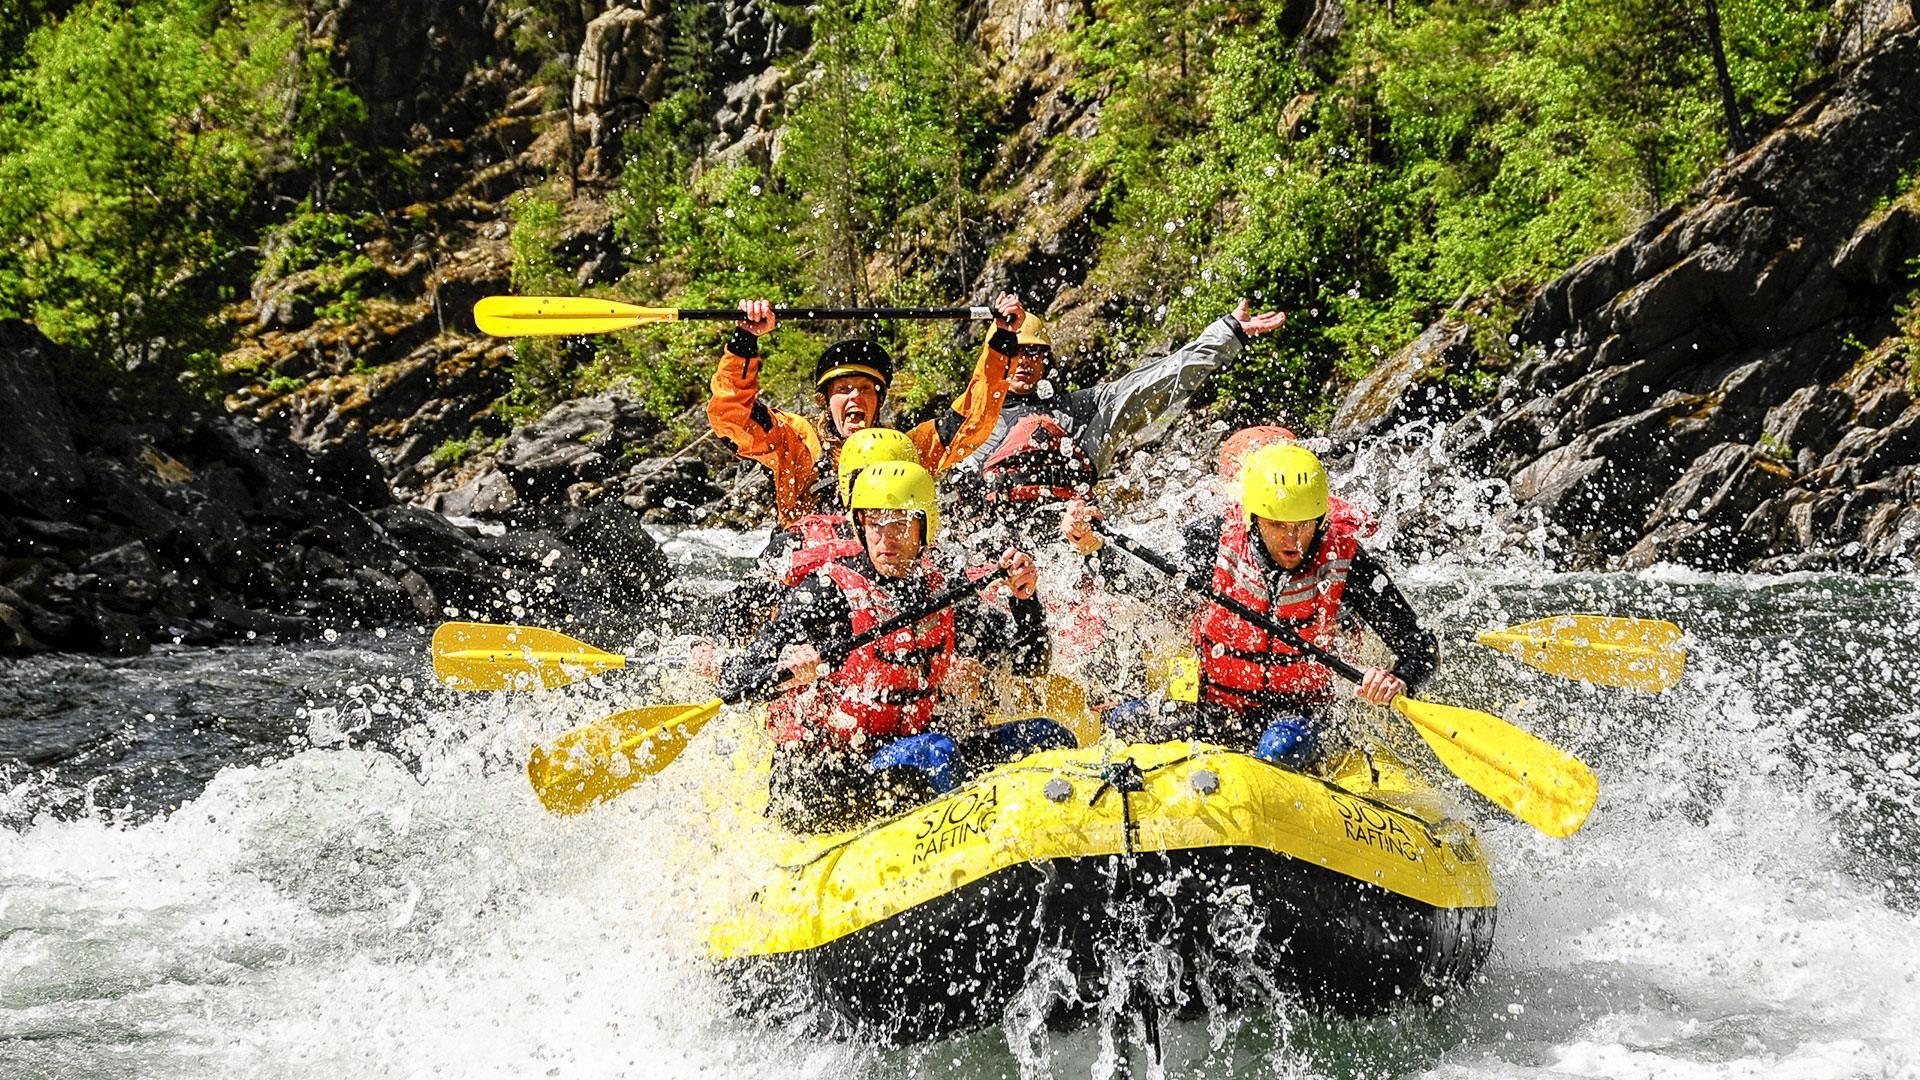 Sjoa Rafting